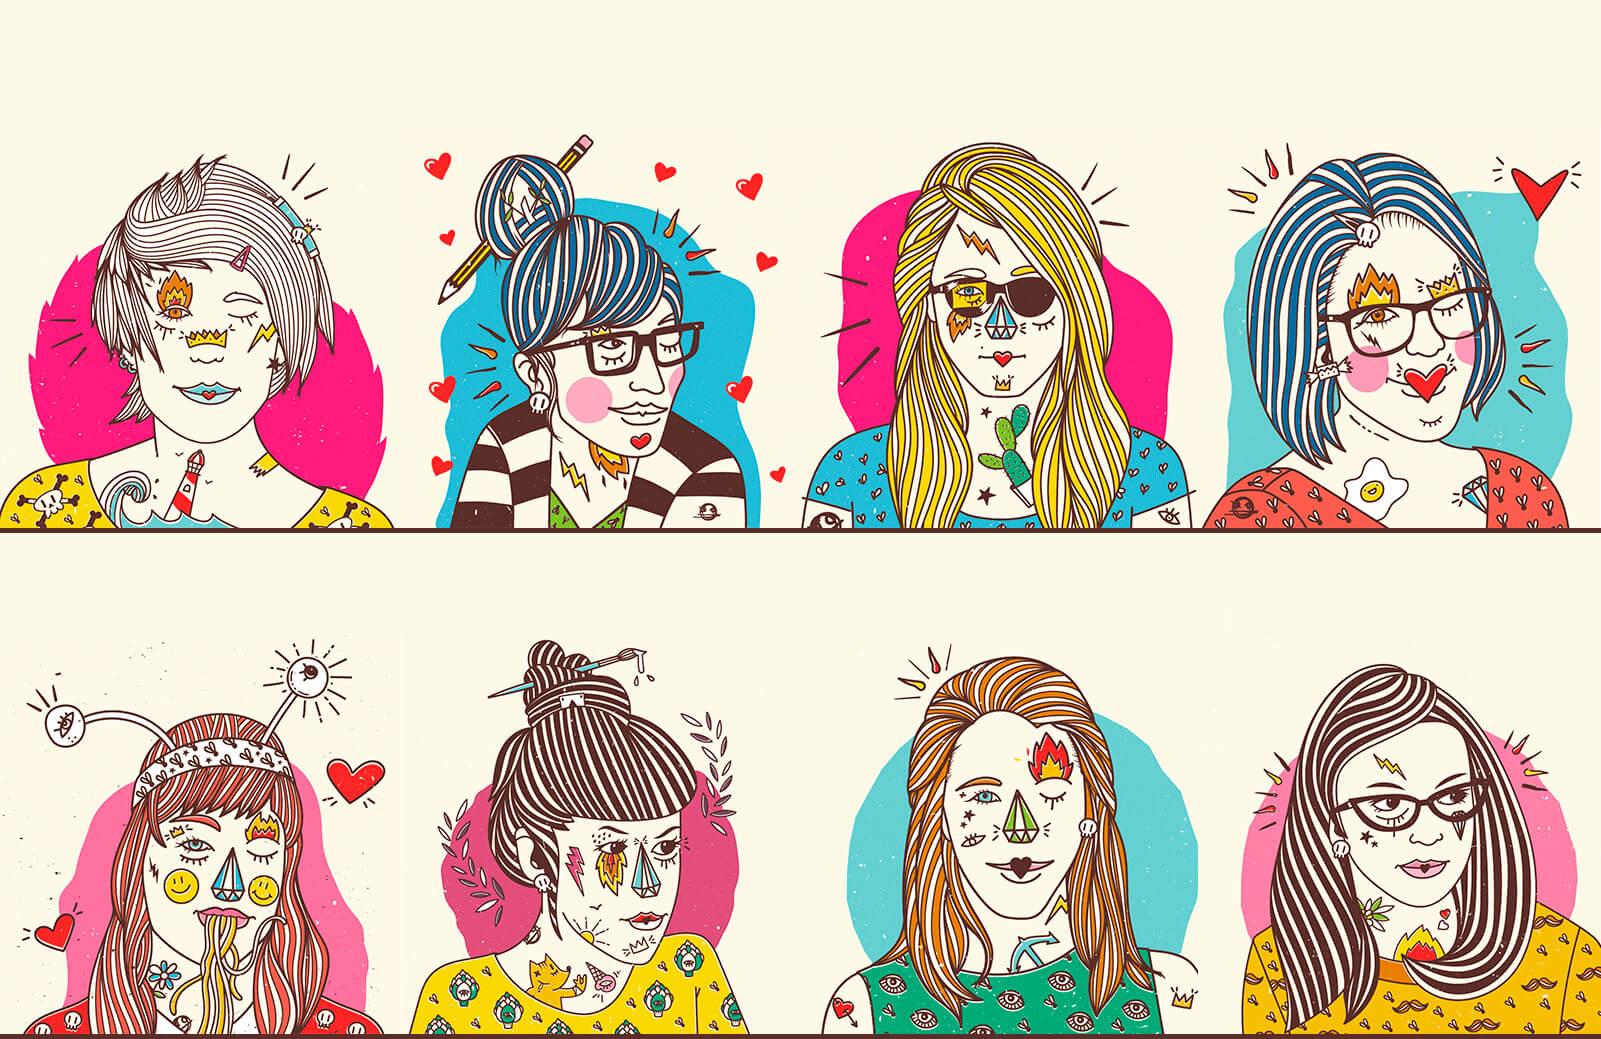 mujeres-vinetas-humor-grafico-espanol-3